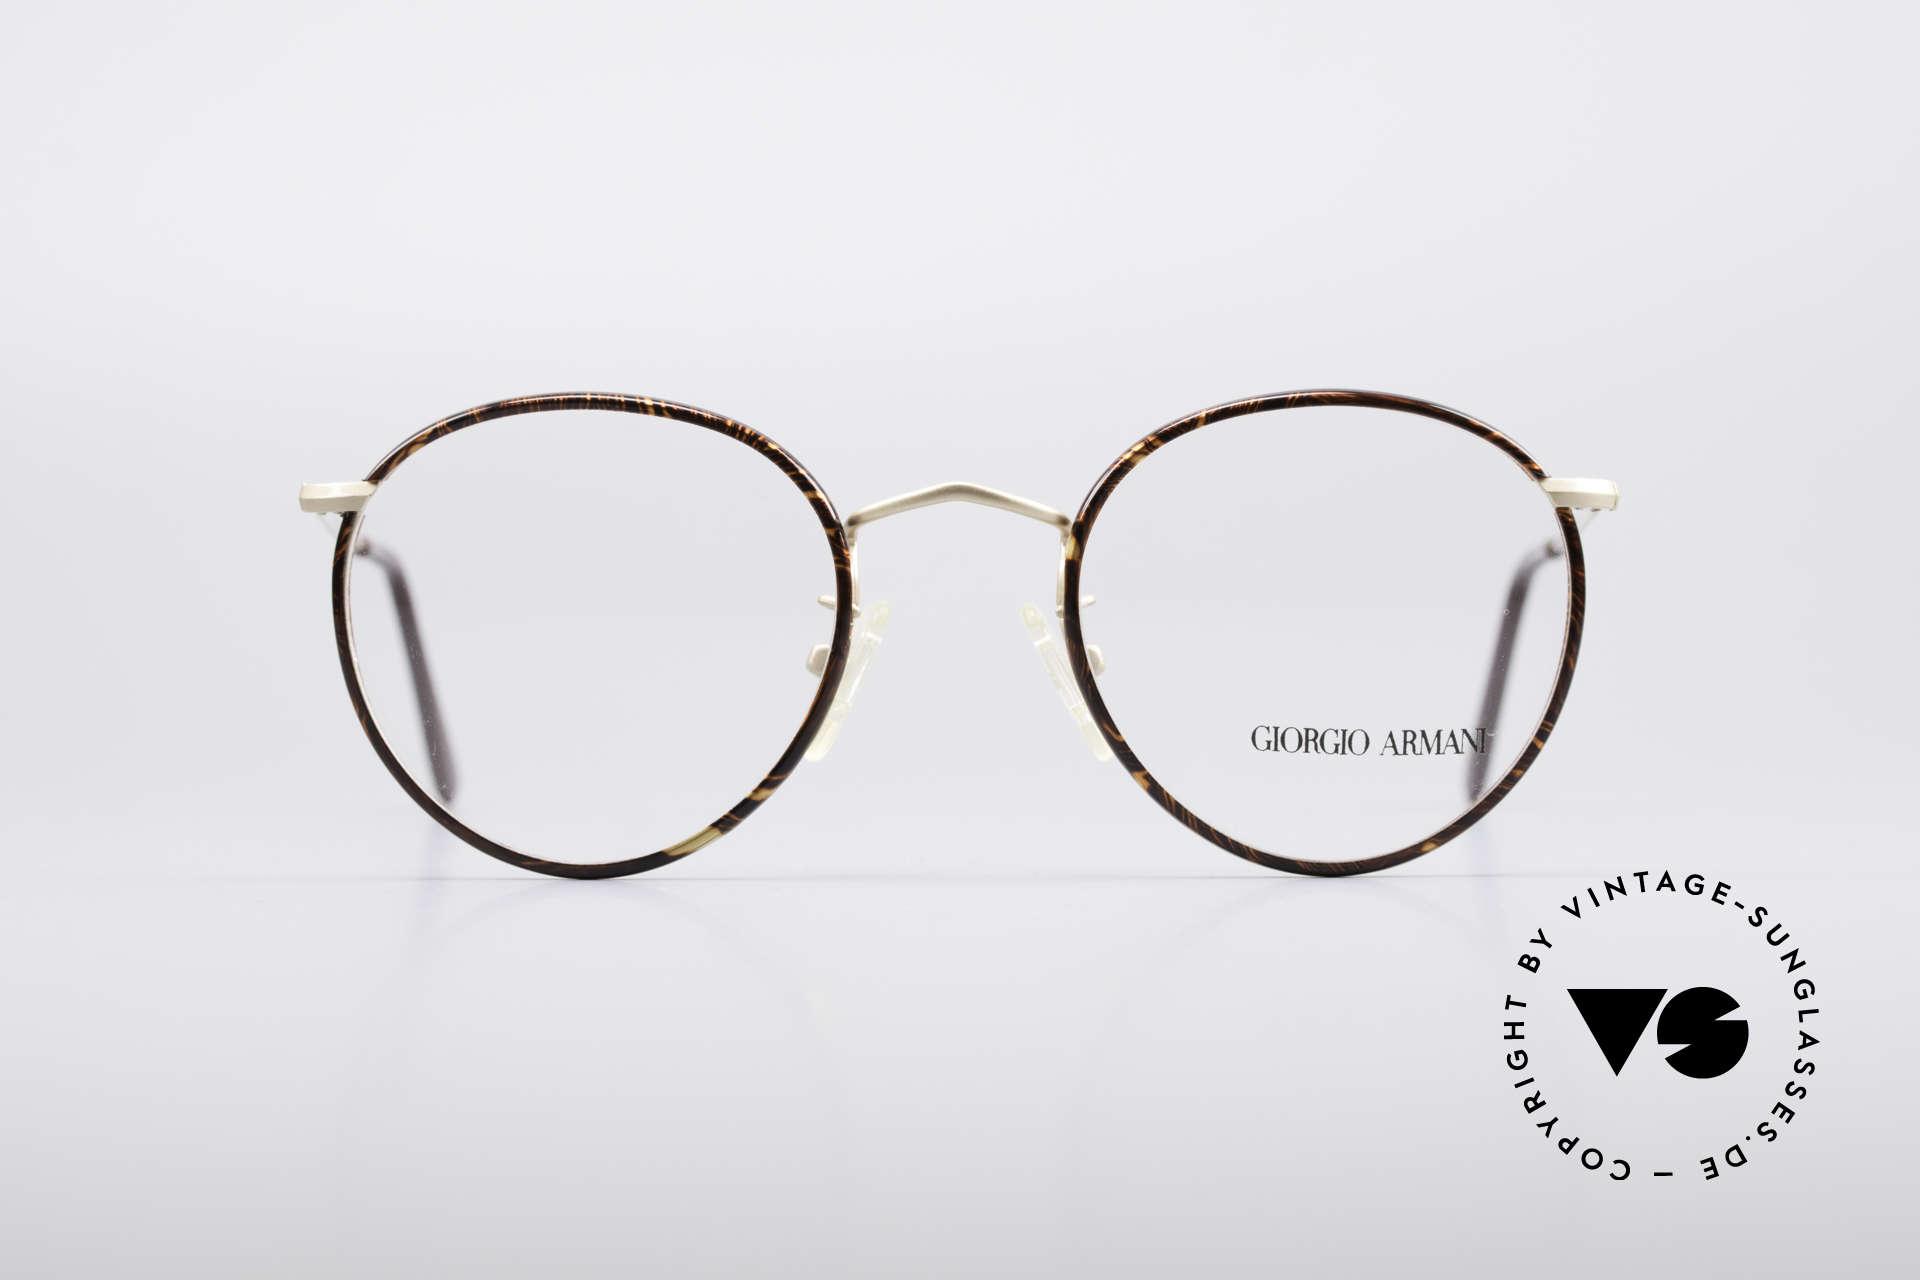 913fd13778 Giorgio Armani 112 90's Panto Eyeglasses